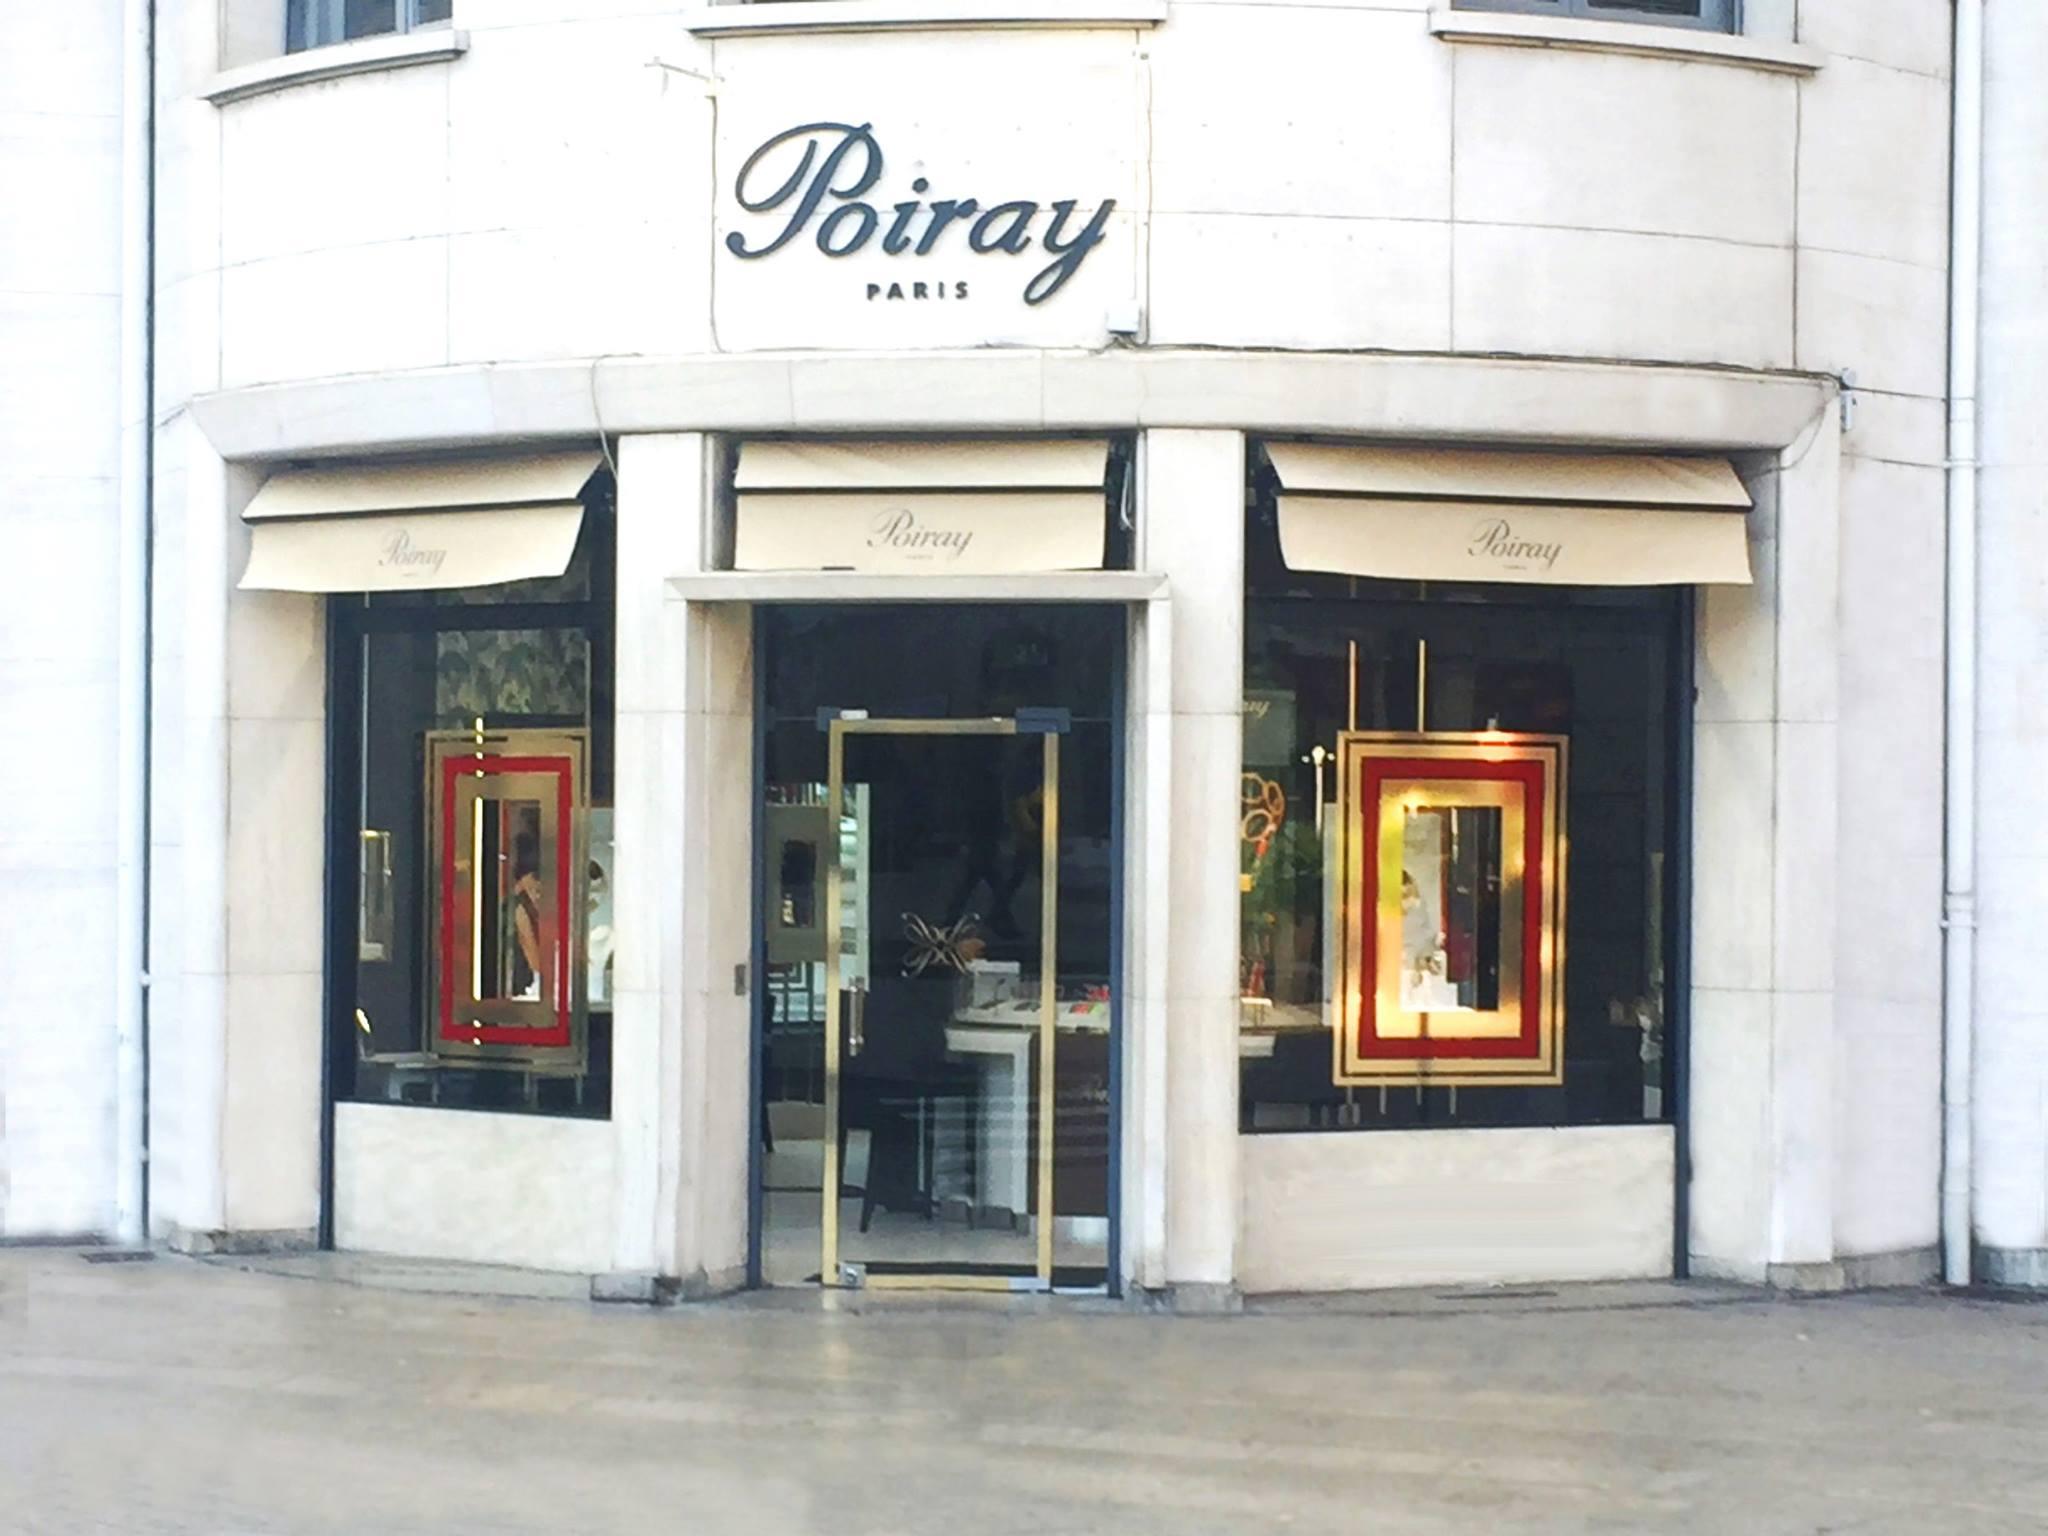 Poiray Lyon